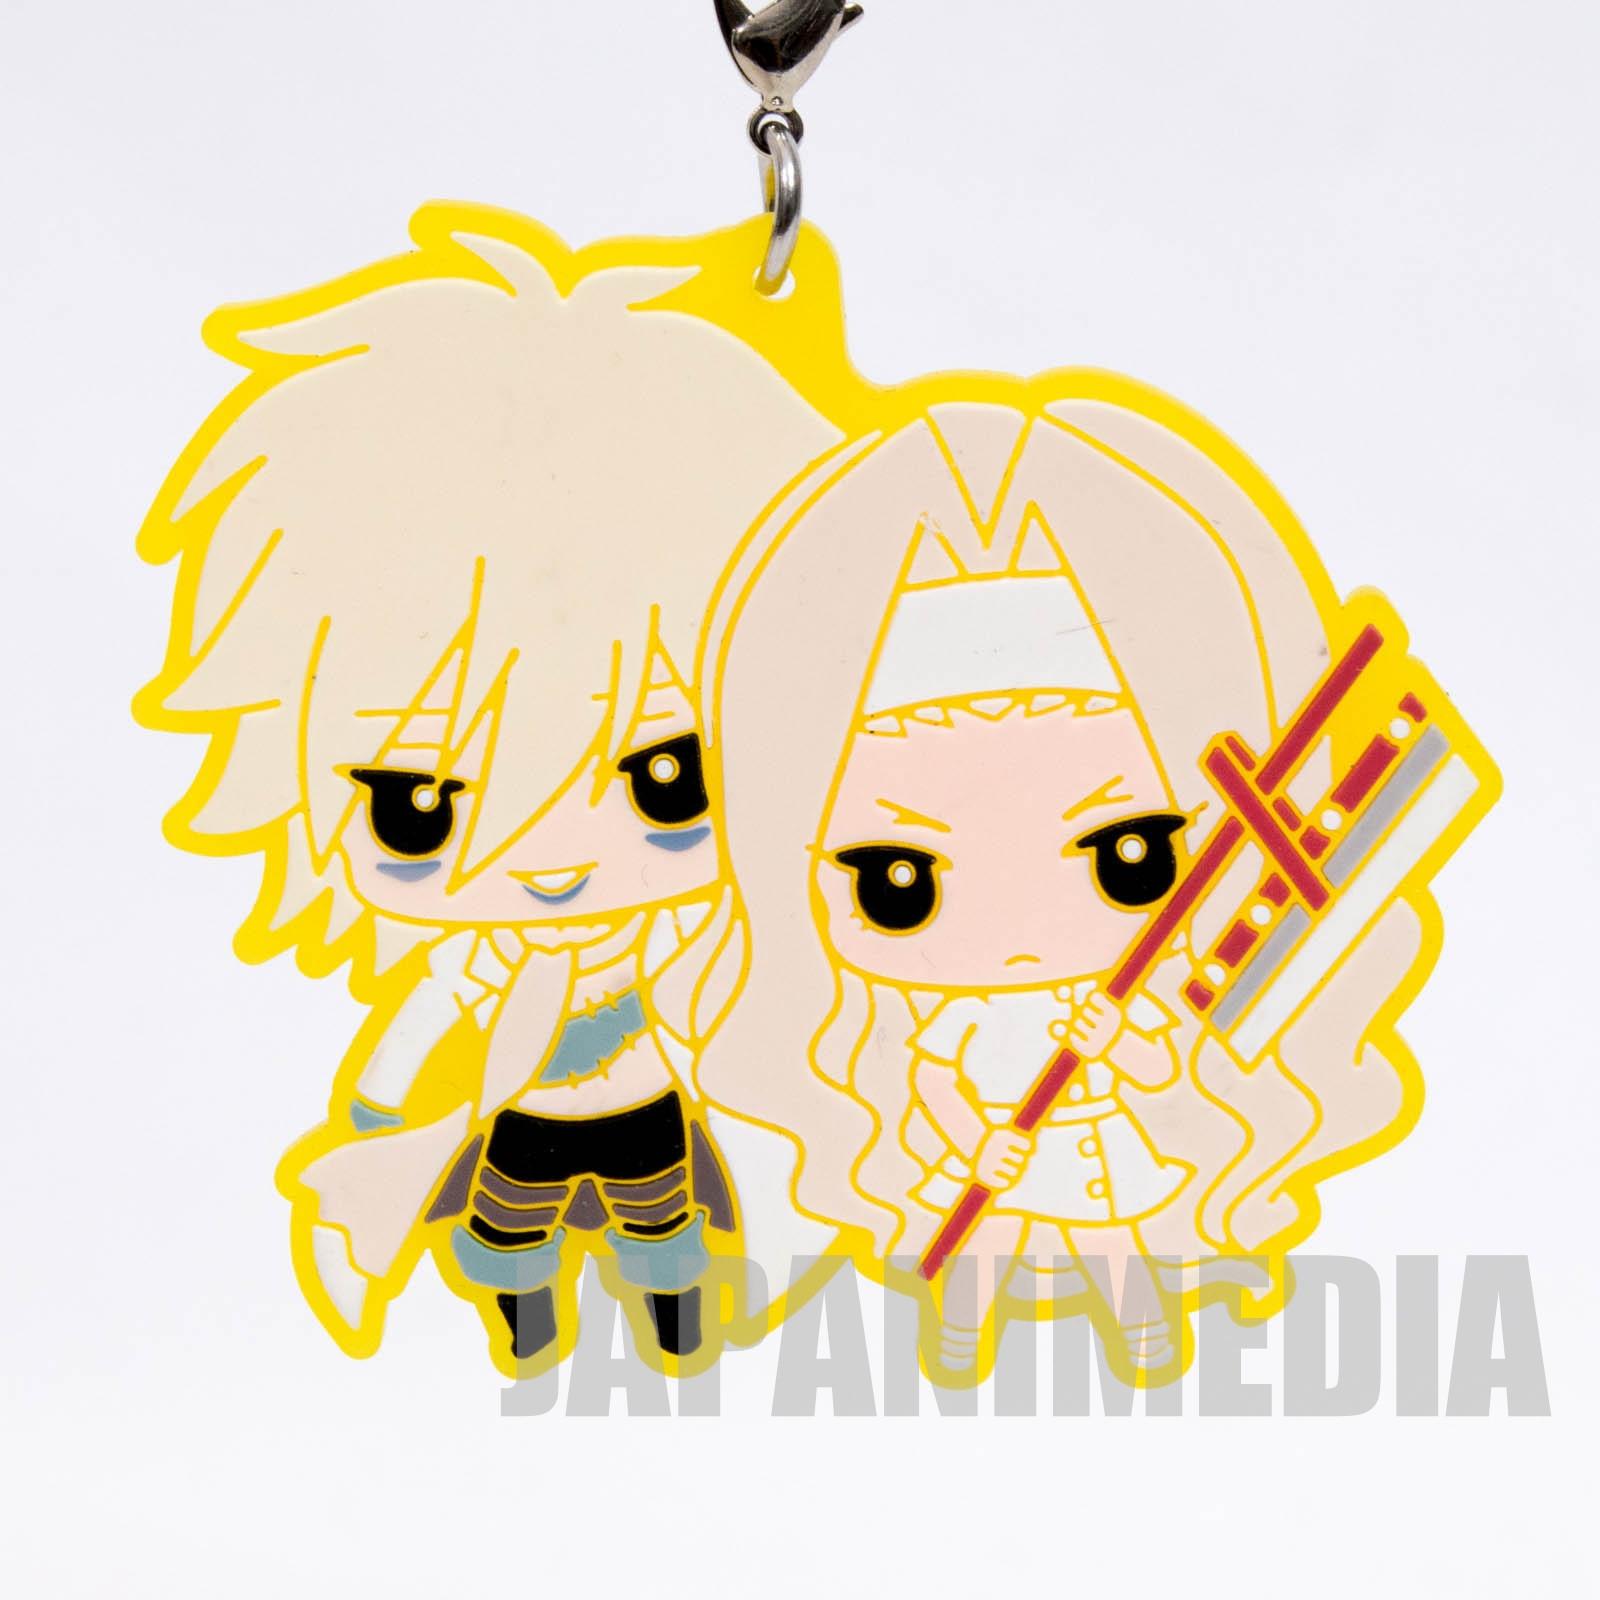 Shaman King Johann Faust VIII & Eliza Capsule Rubber mascot strap 2 JAPAN MANGA